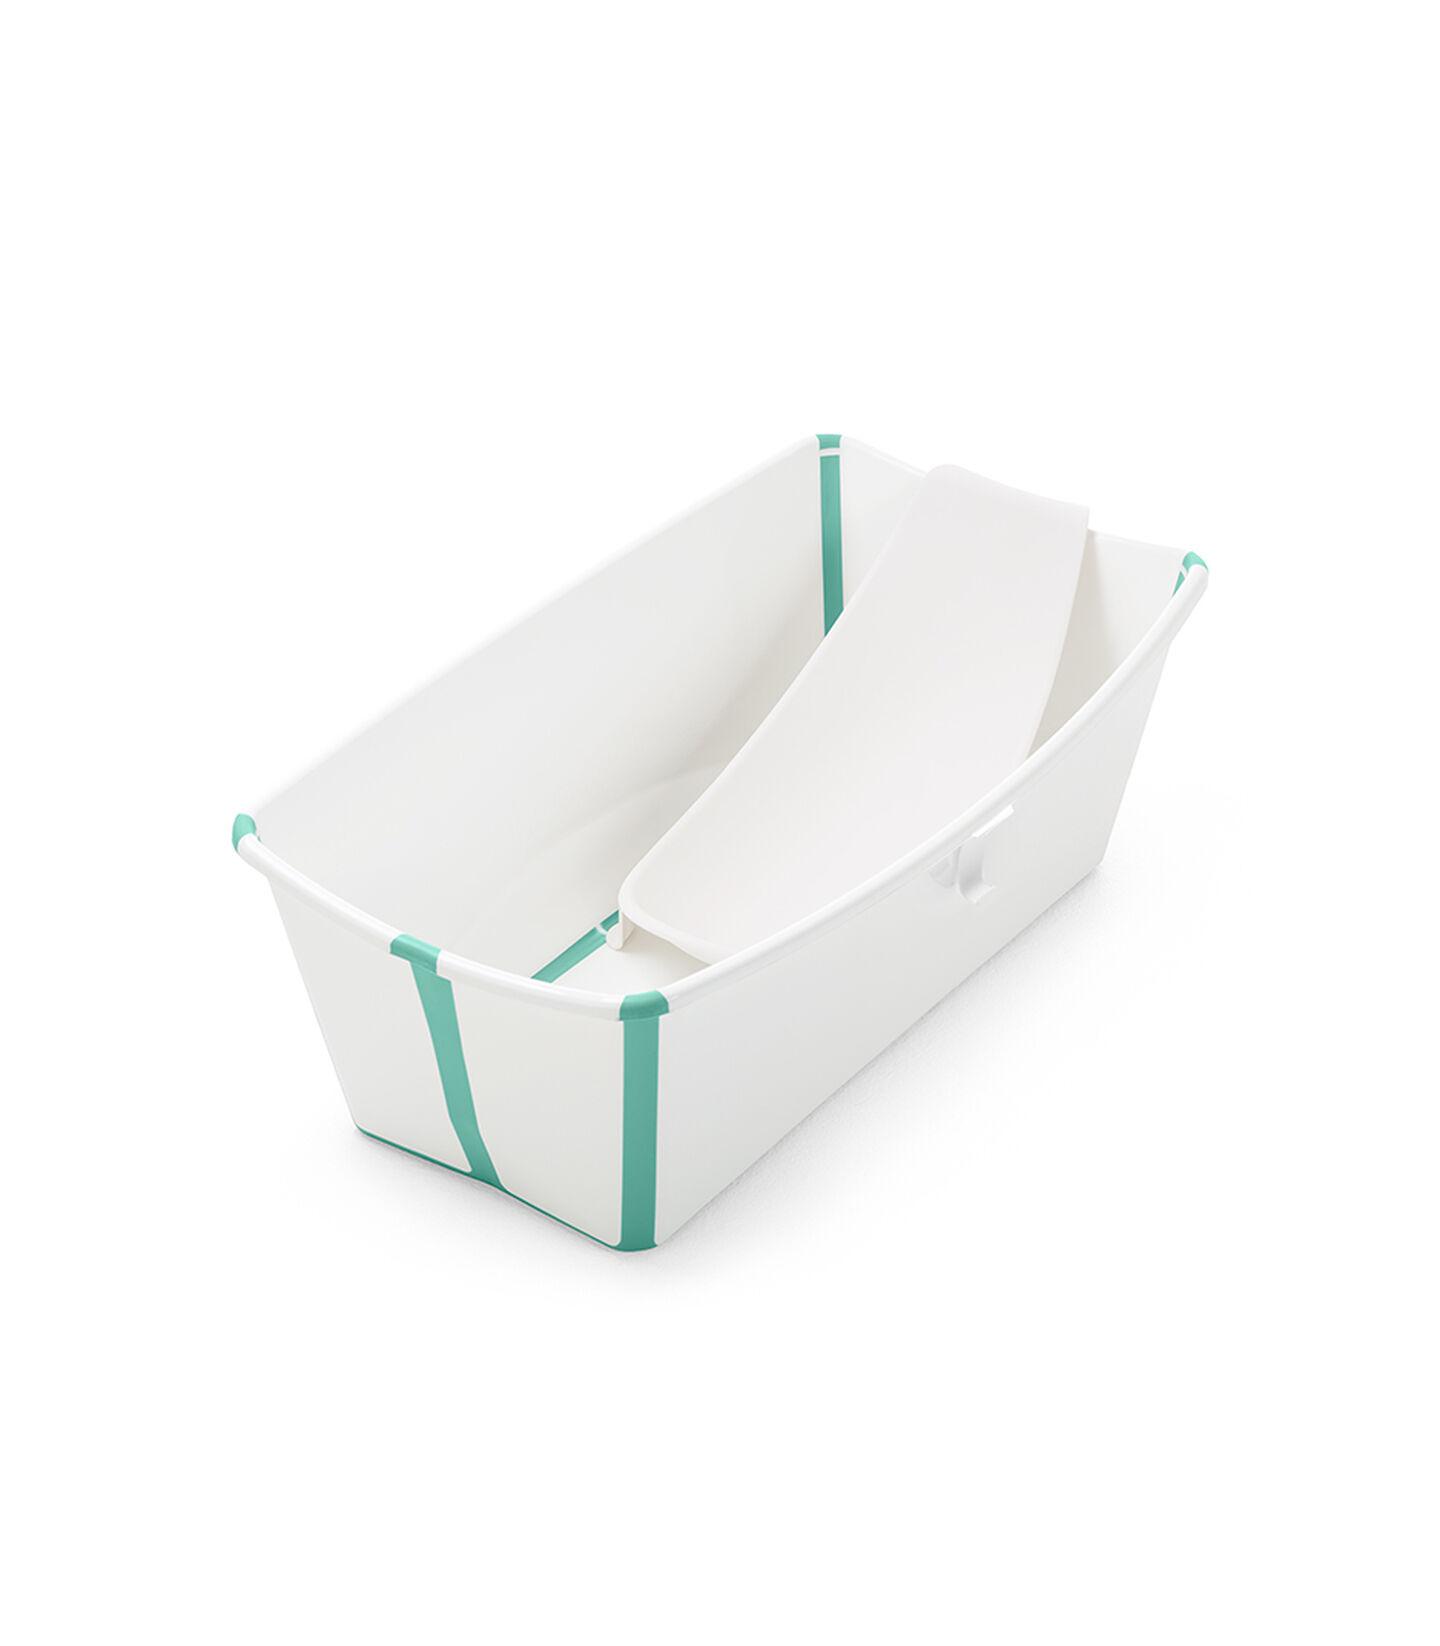 Stokke® Flexi Bath® Heat Bundle White Aqua, White Aqua, mainview view 1